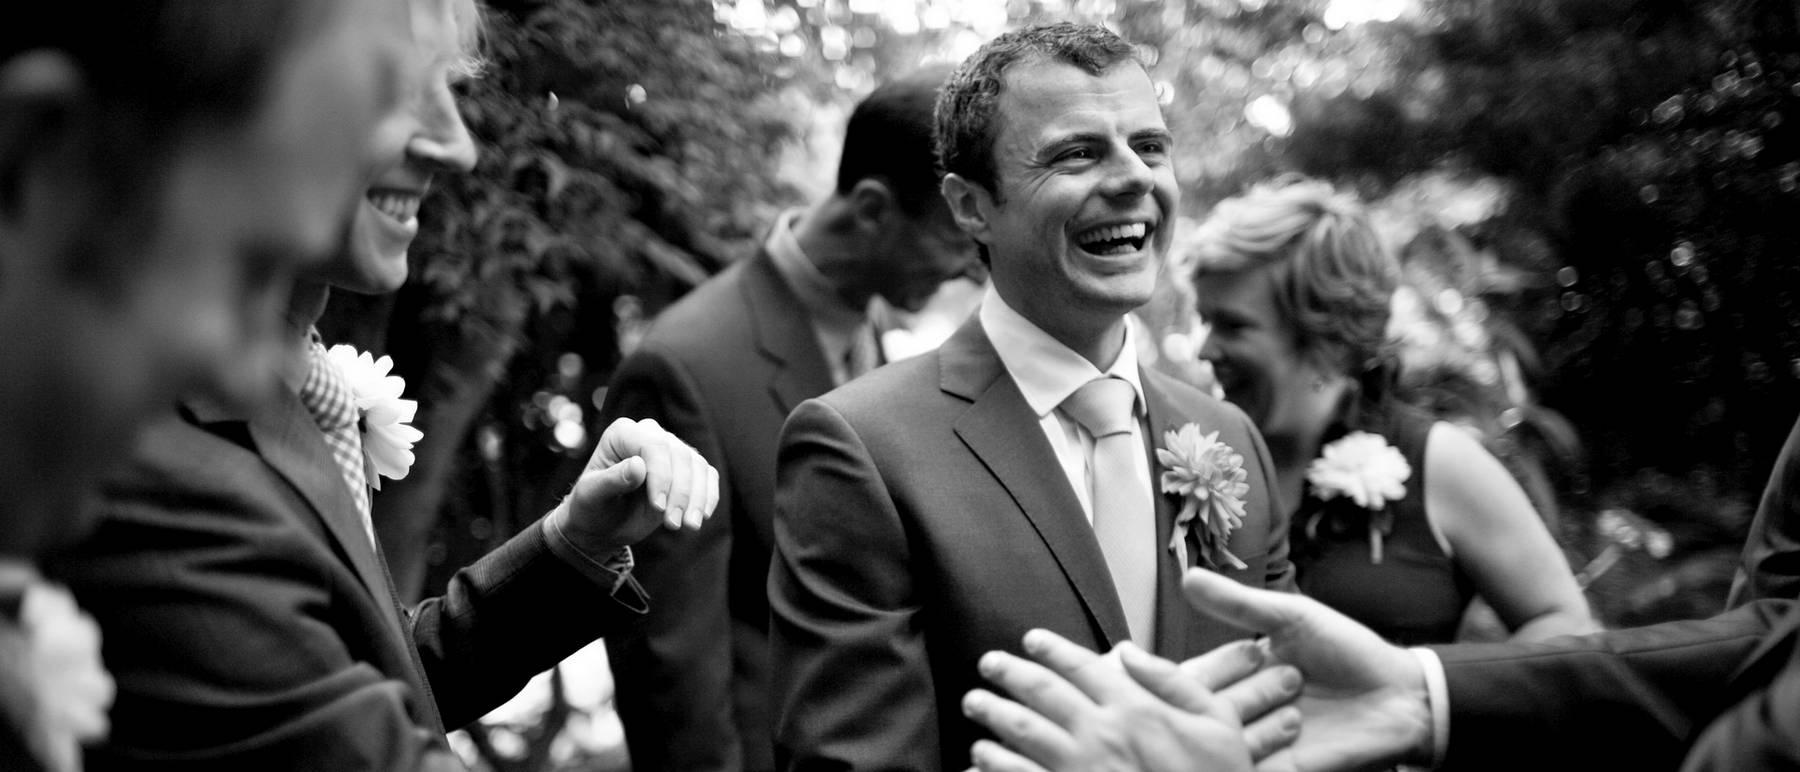 johnandjoseph-wedding-photographer-hz-slider-343